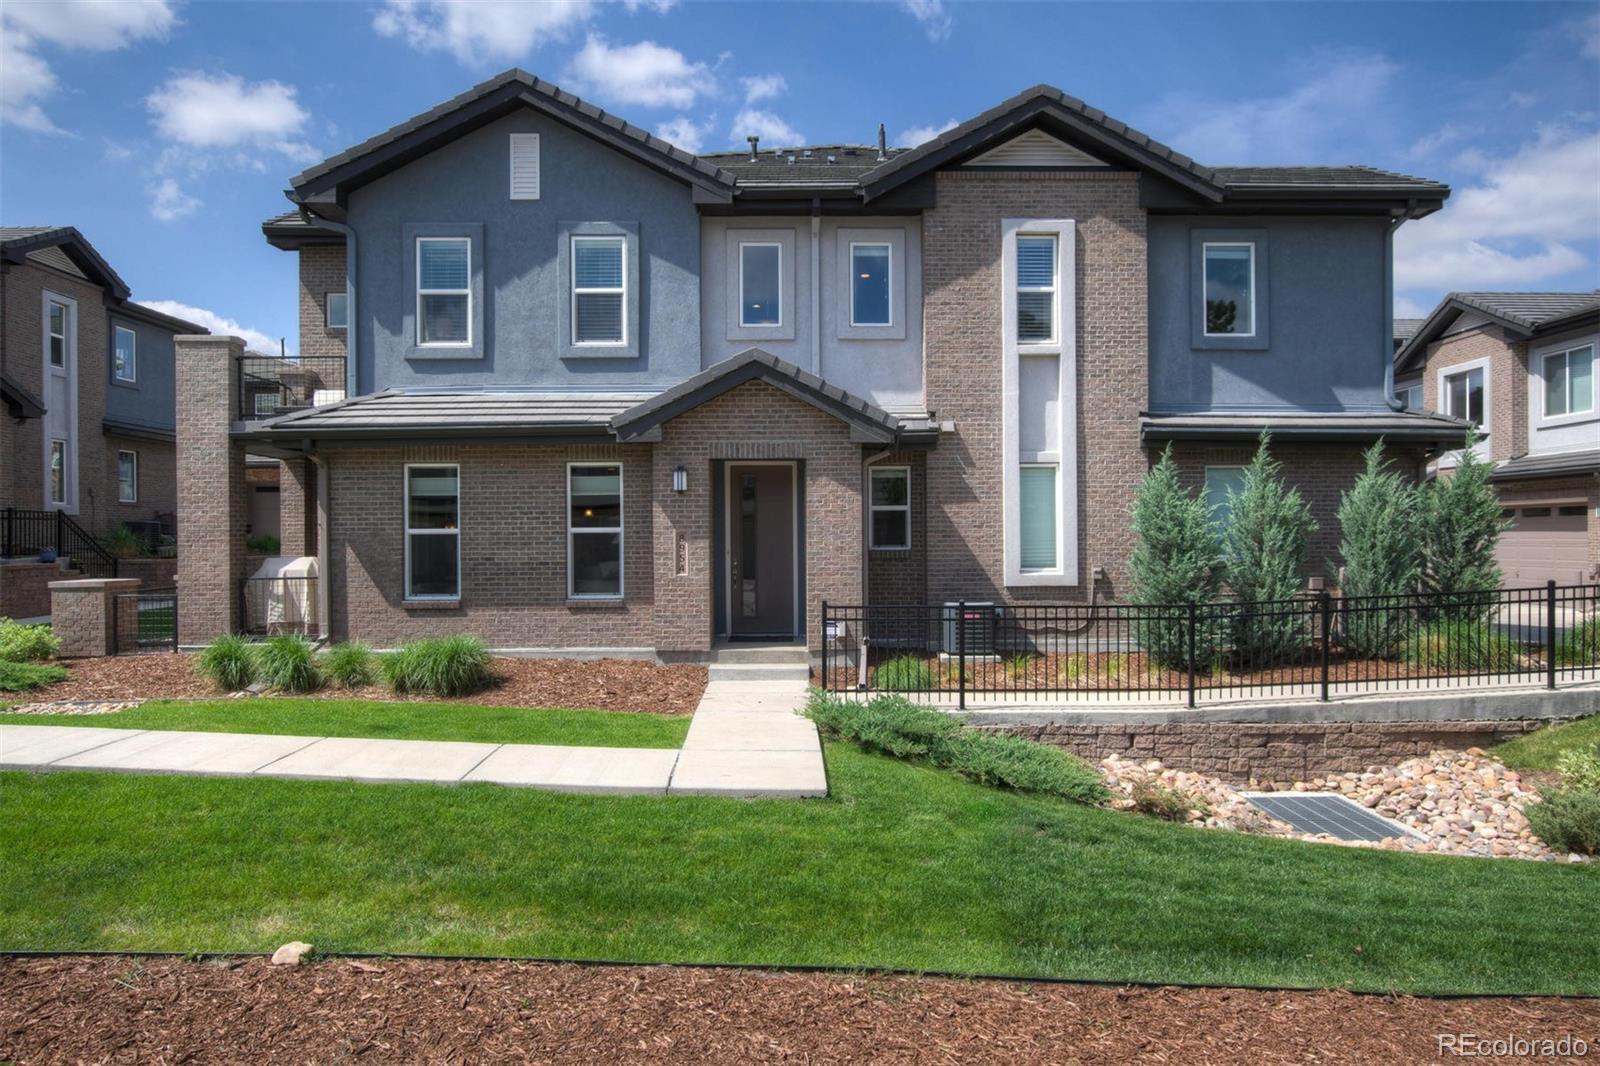 8954 E Caley Way Property Photo - Centennial, CO real estate listing